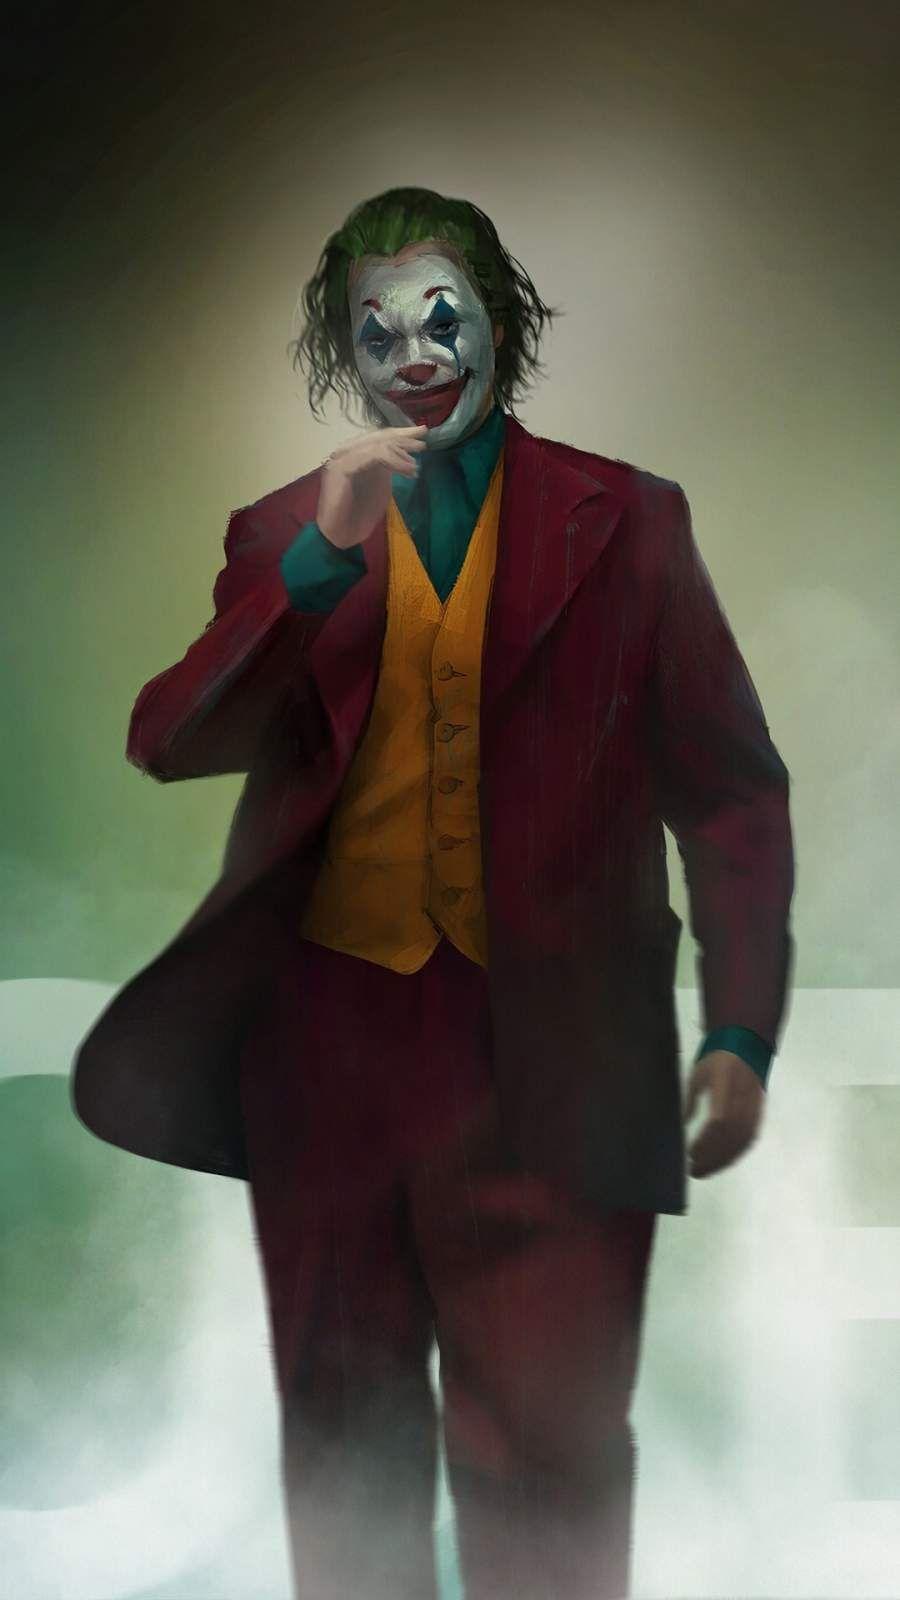 Joker Walking Art Iphone Wallpaper Joker Wallpaper Walking Art Batman Joker Wallpaper